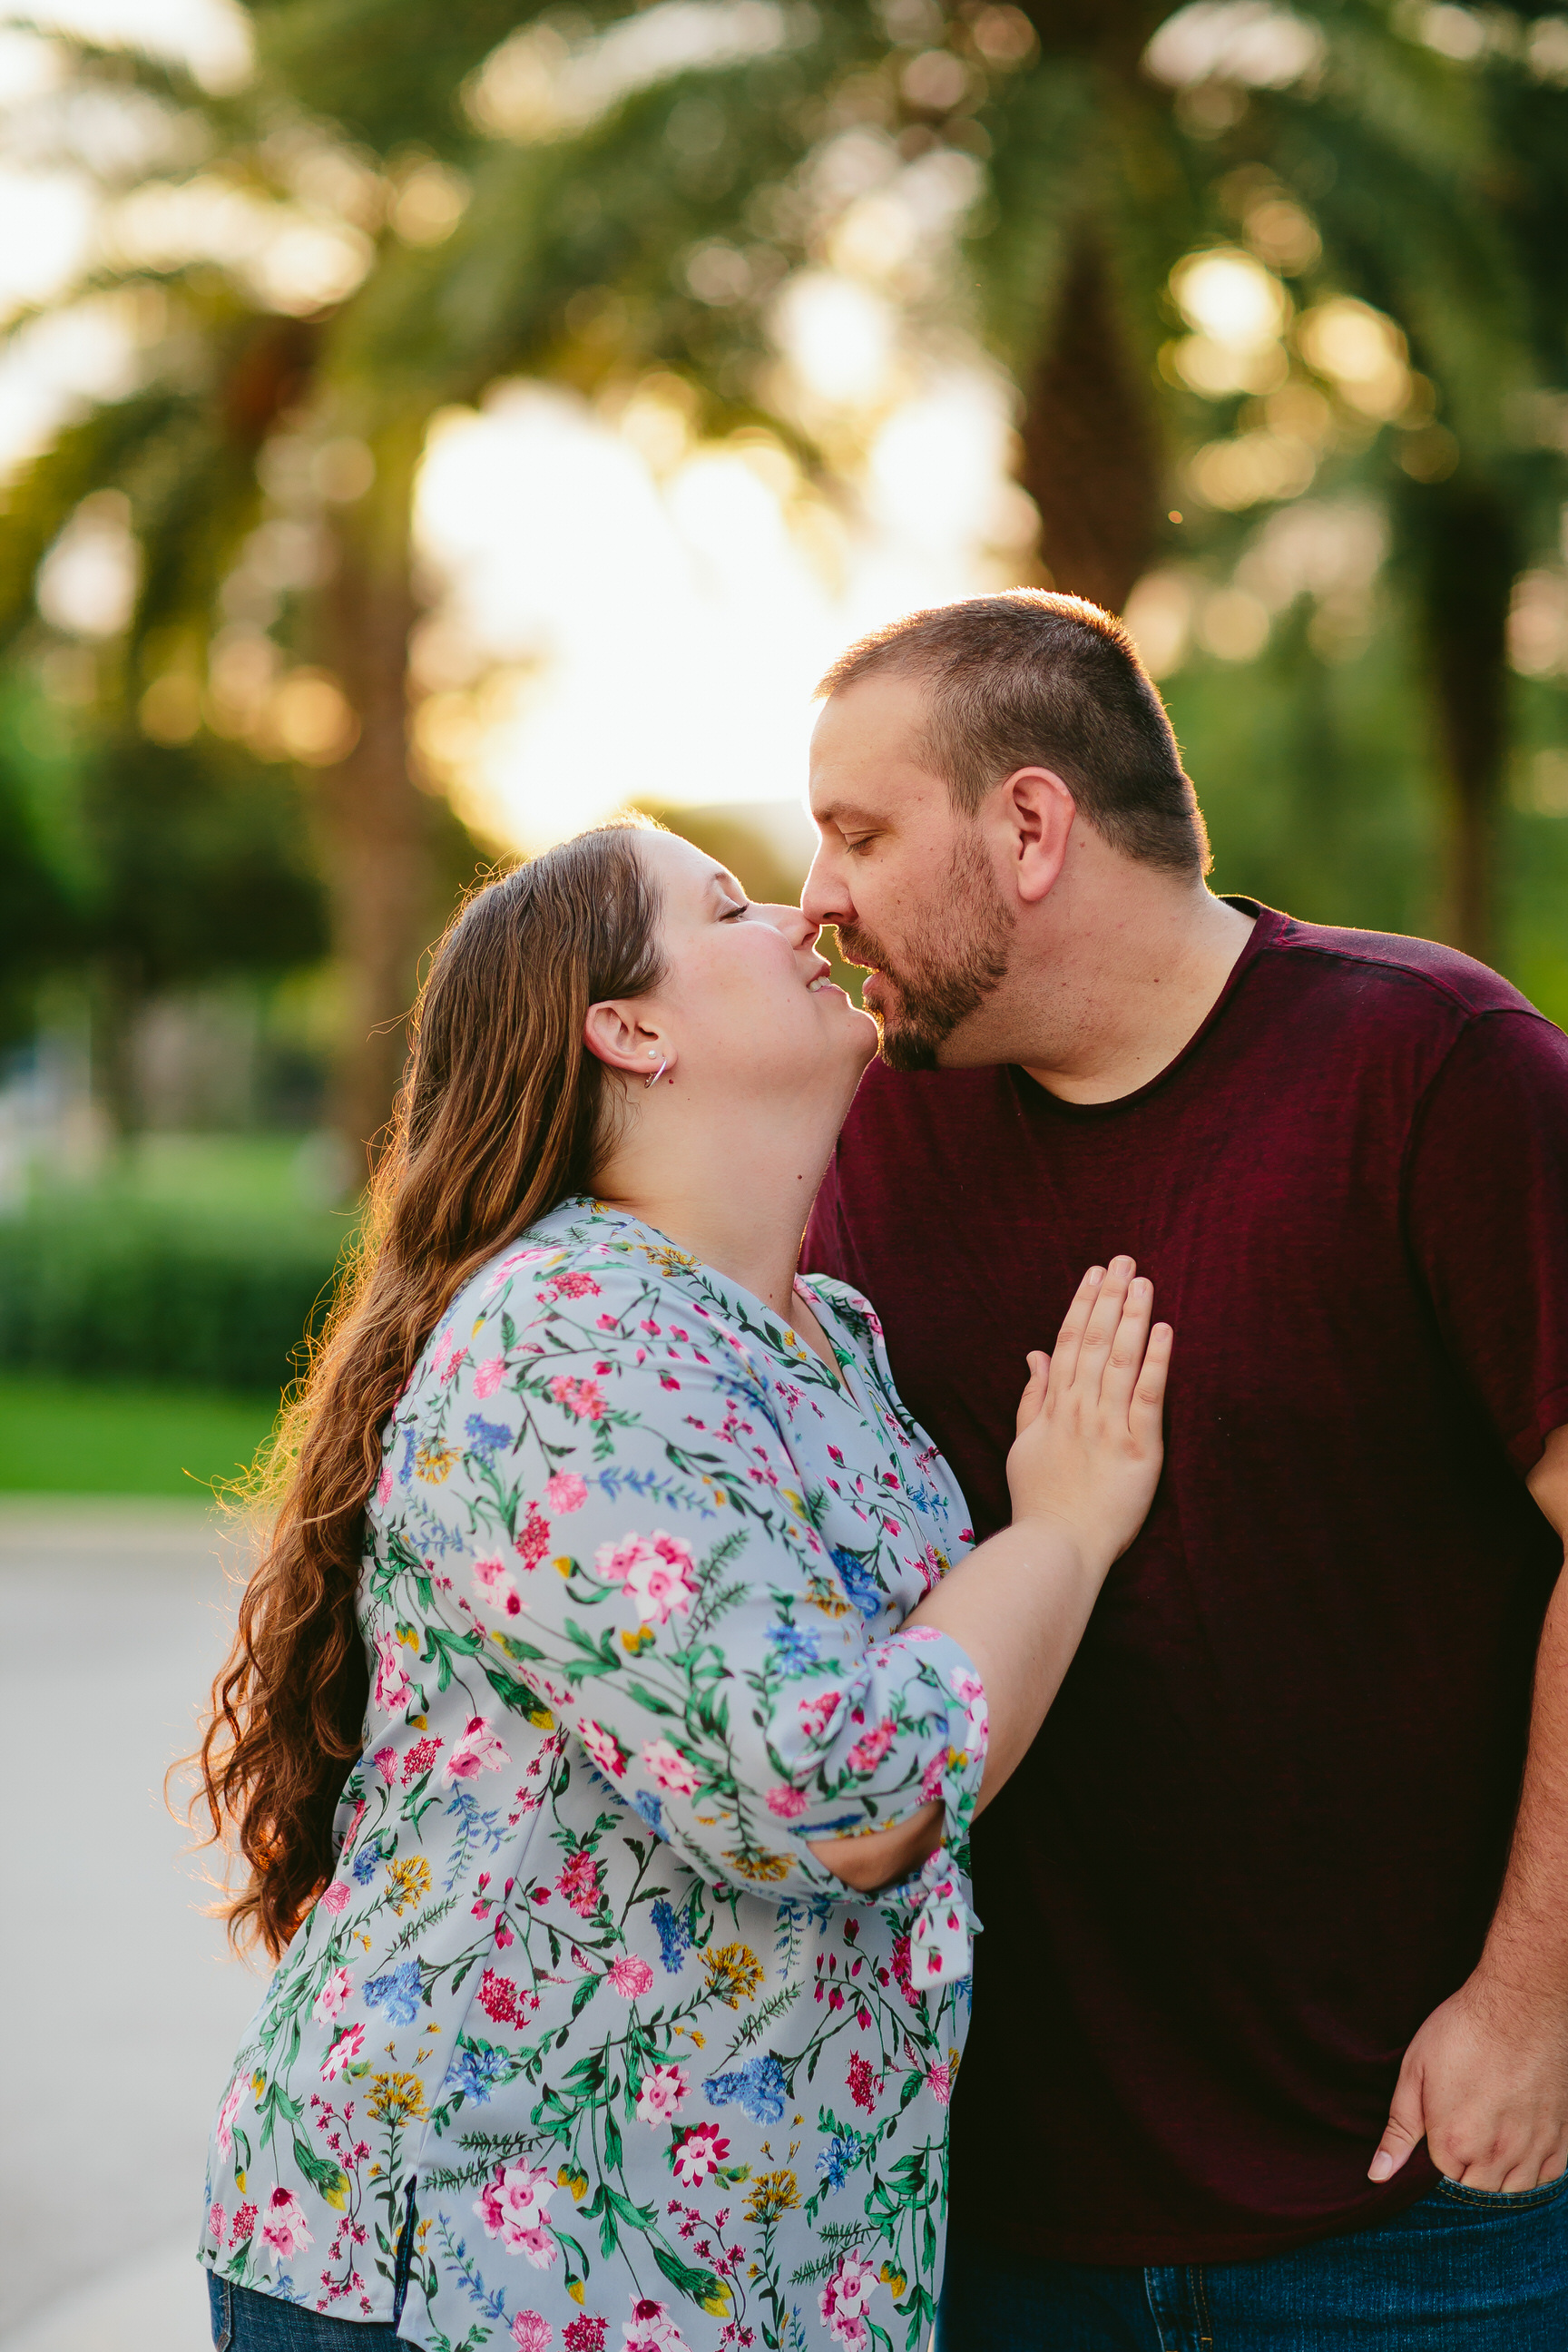 Kissing_Romantic_Couple_Love_FAU_Owls.jpg